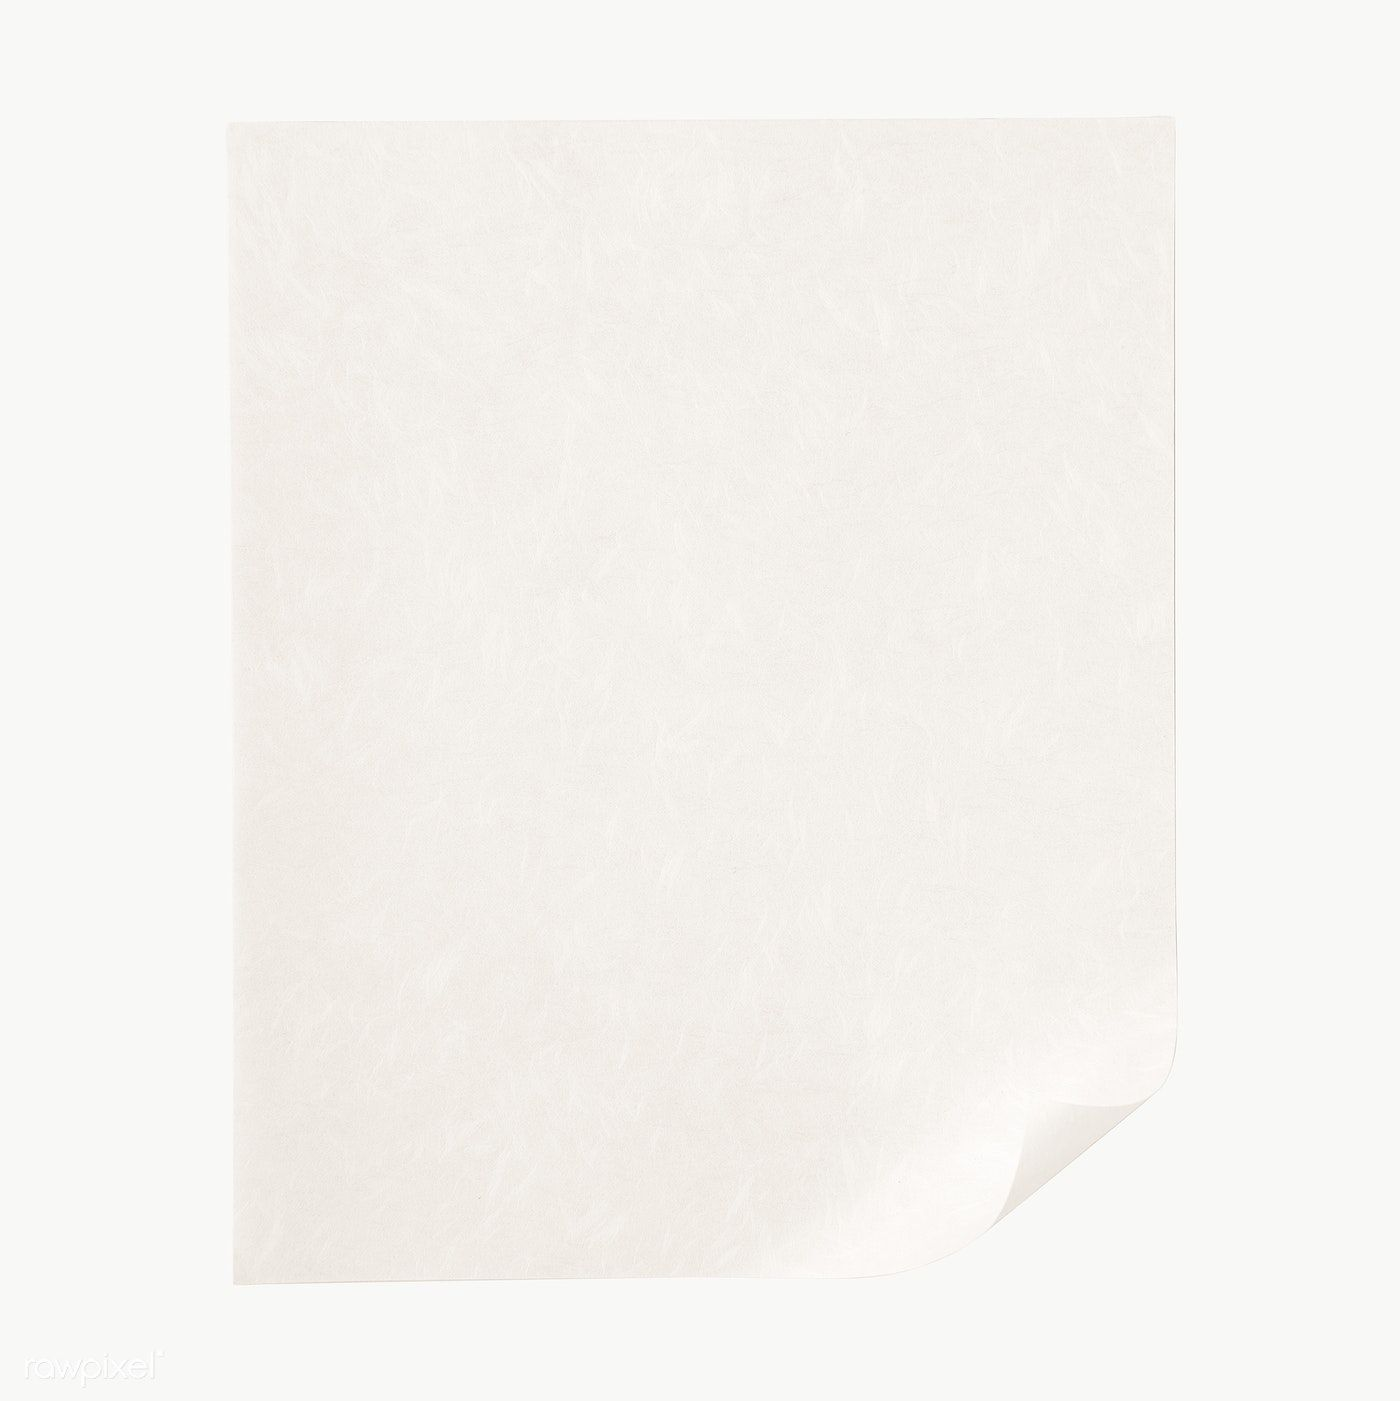 Download Premium Png Of Blank Plain Beige Paper Transparent Png 2026301 Note Paper Paper Image Paper